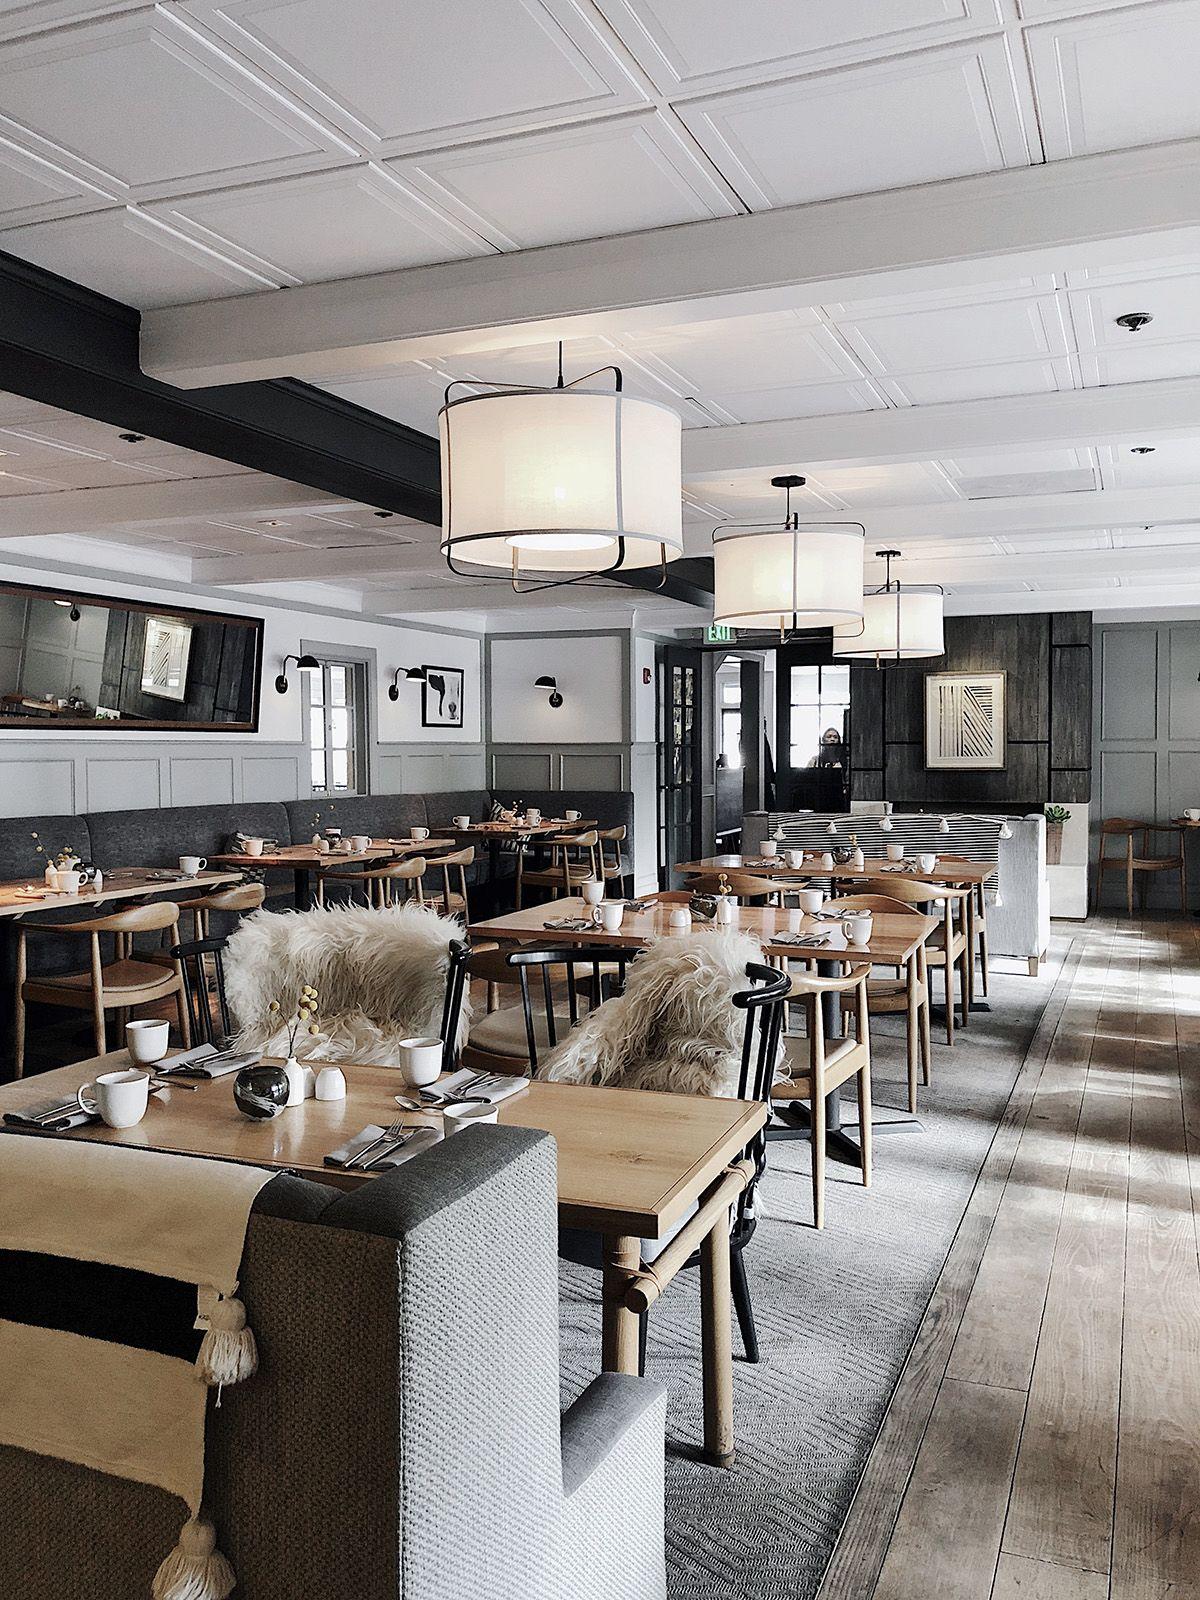 Host Restaurant Rustic Scandinavian Interior Minimalism Design Visual Reclaimed Wood Ceiling House Design Interior